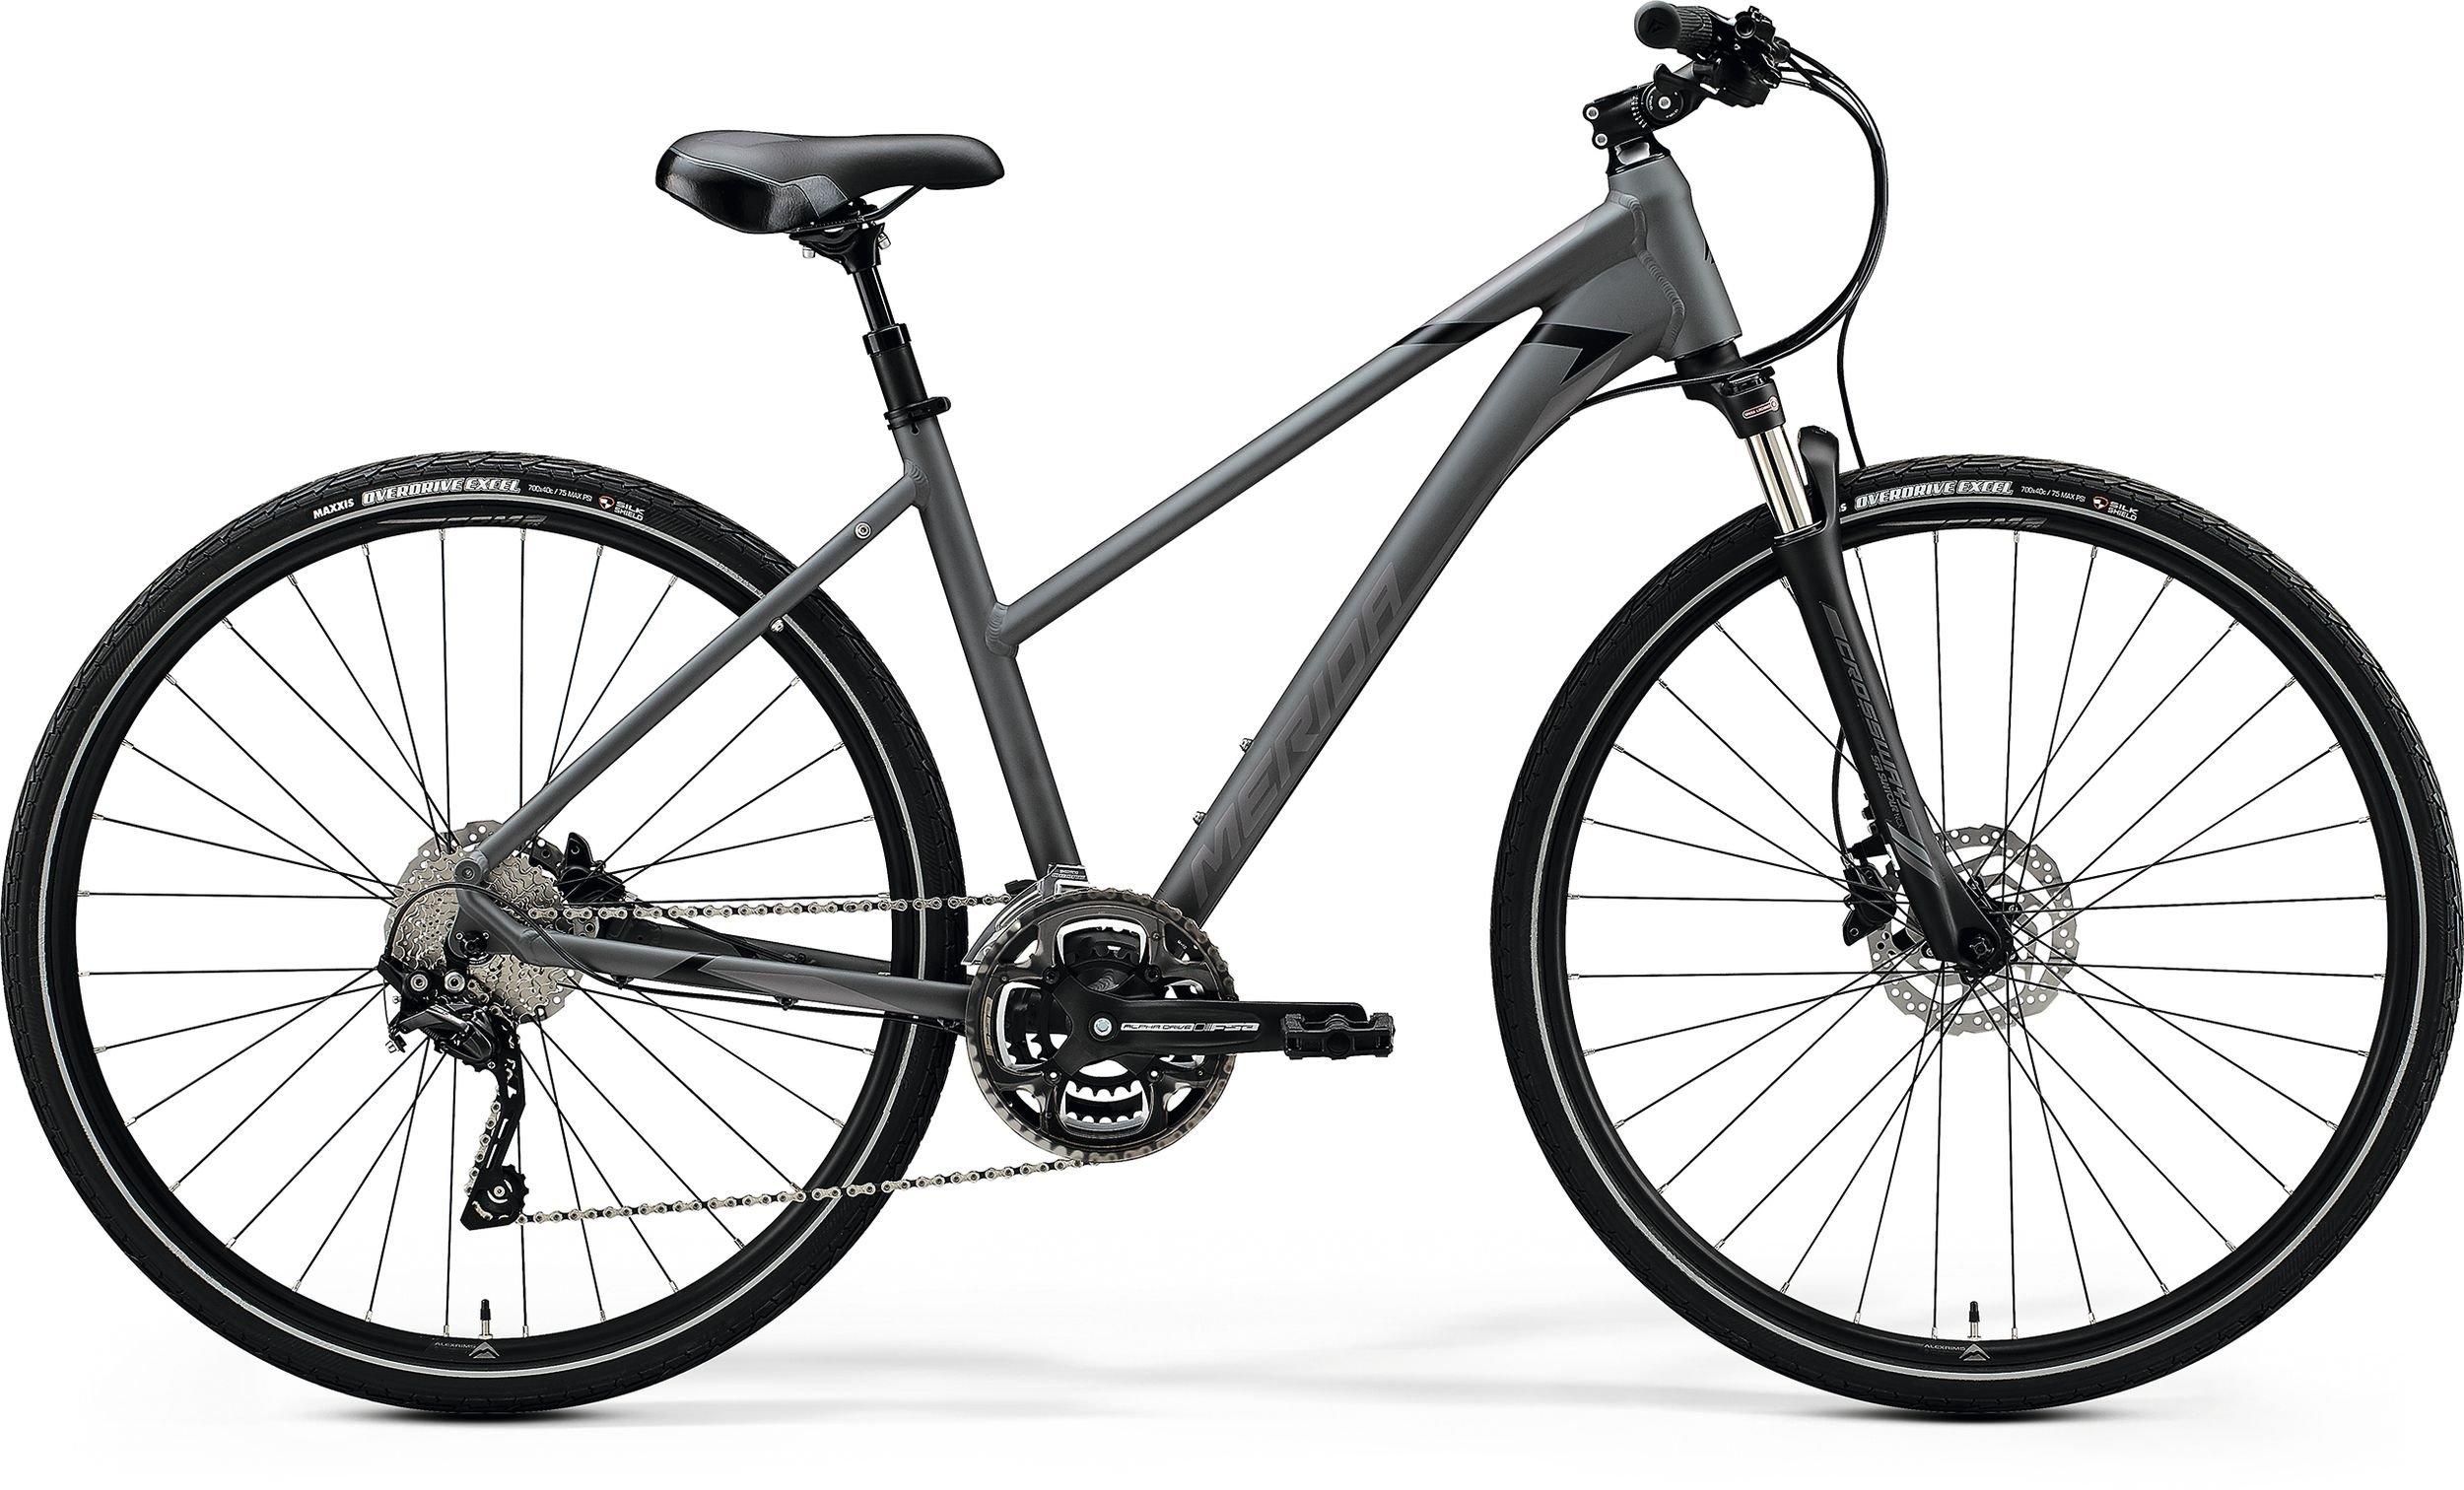 Merida CROSSWAY 300-LADY šedé/černé (165-175 cm)